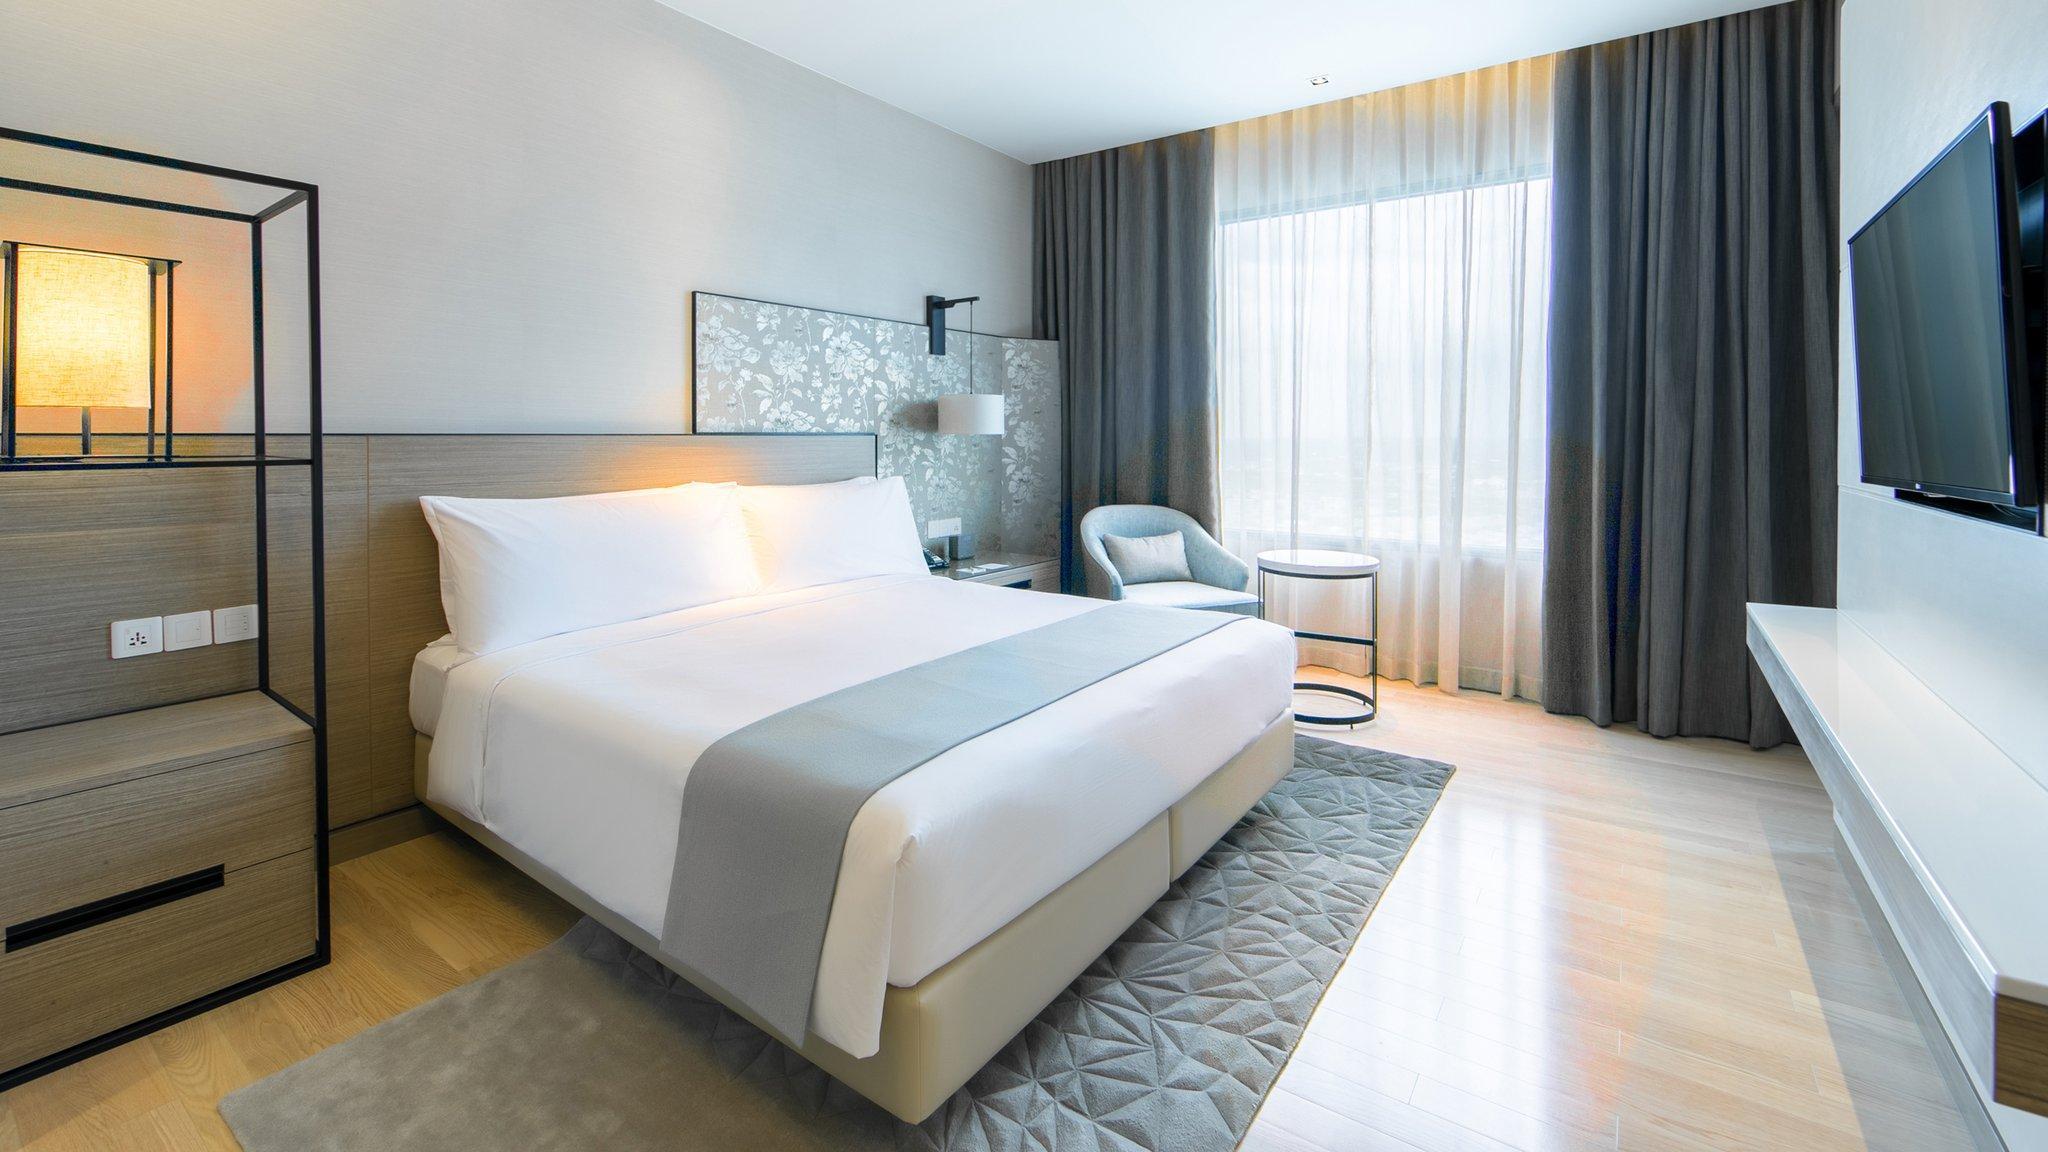 2 Bedroom 3 Bed Suite Non-Smoking